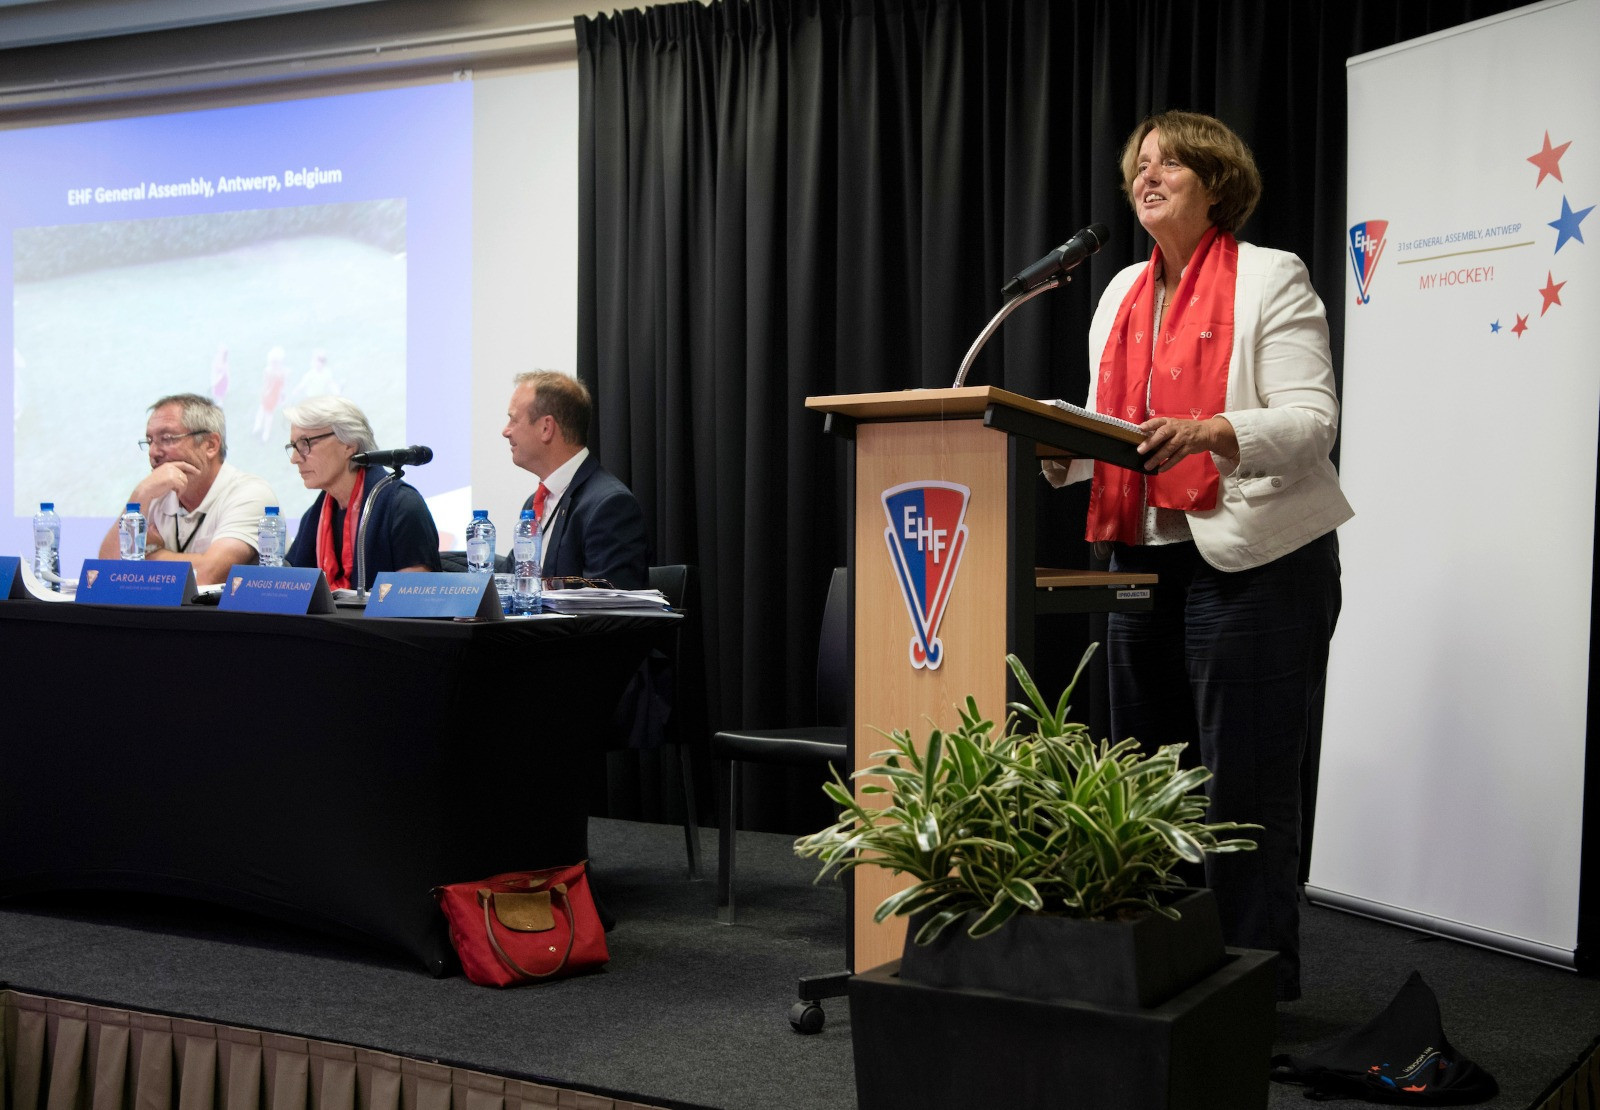 Fleuren re-elected to serve third term as European Hockey Federation President